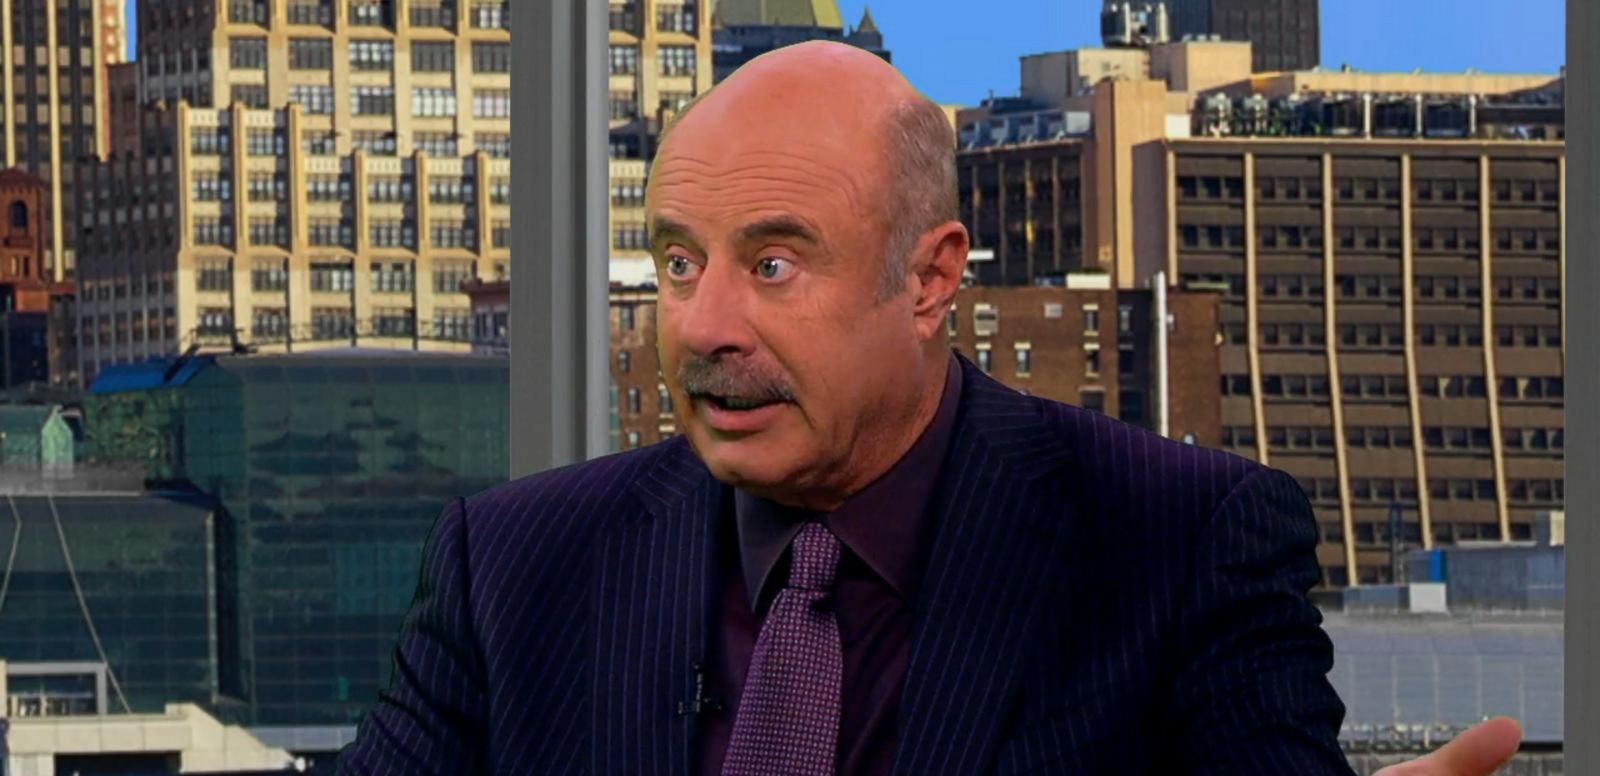 VIDEO: Daytime Docs Under Fire: Watch Dr. Phil Respond to Dr. Oz Critics